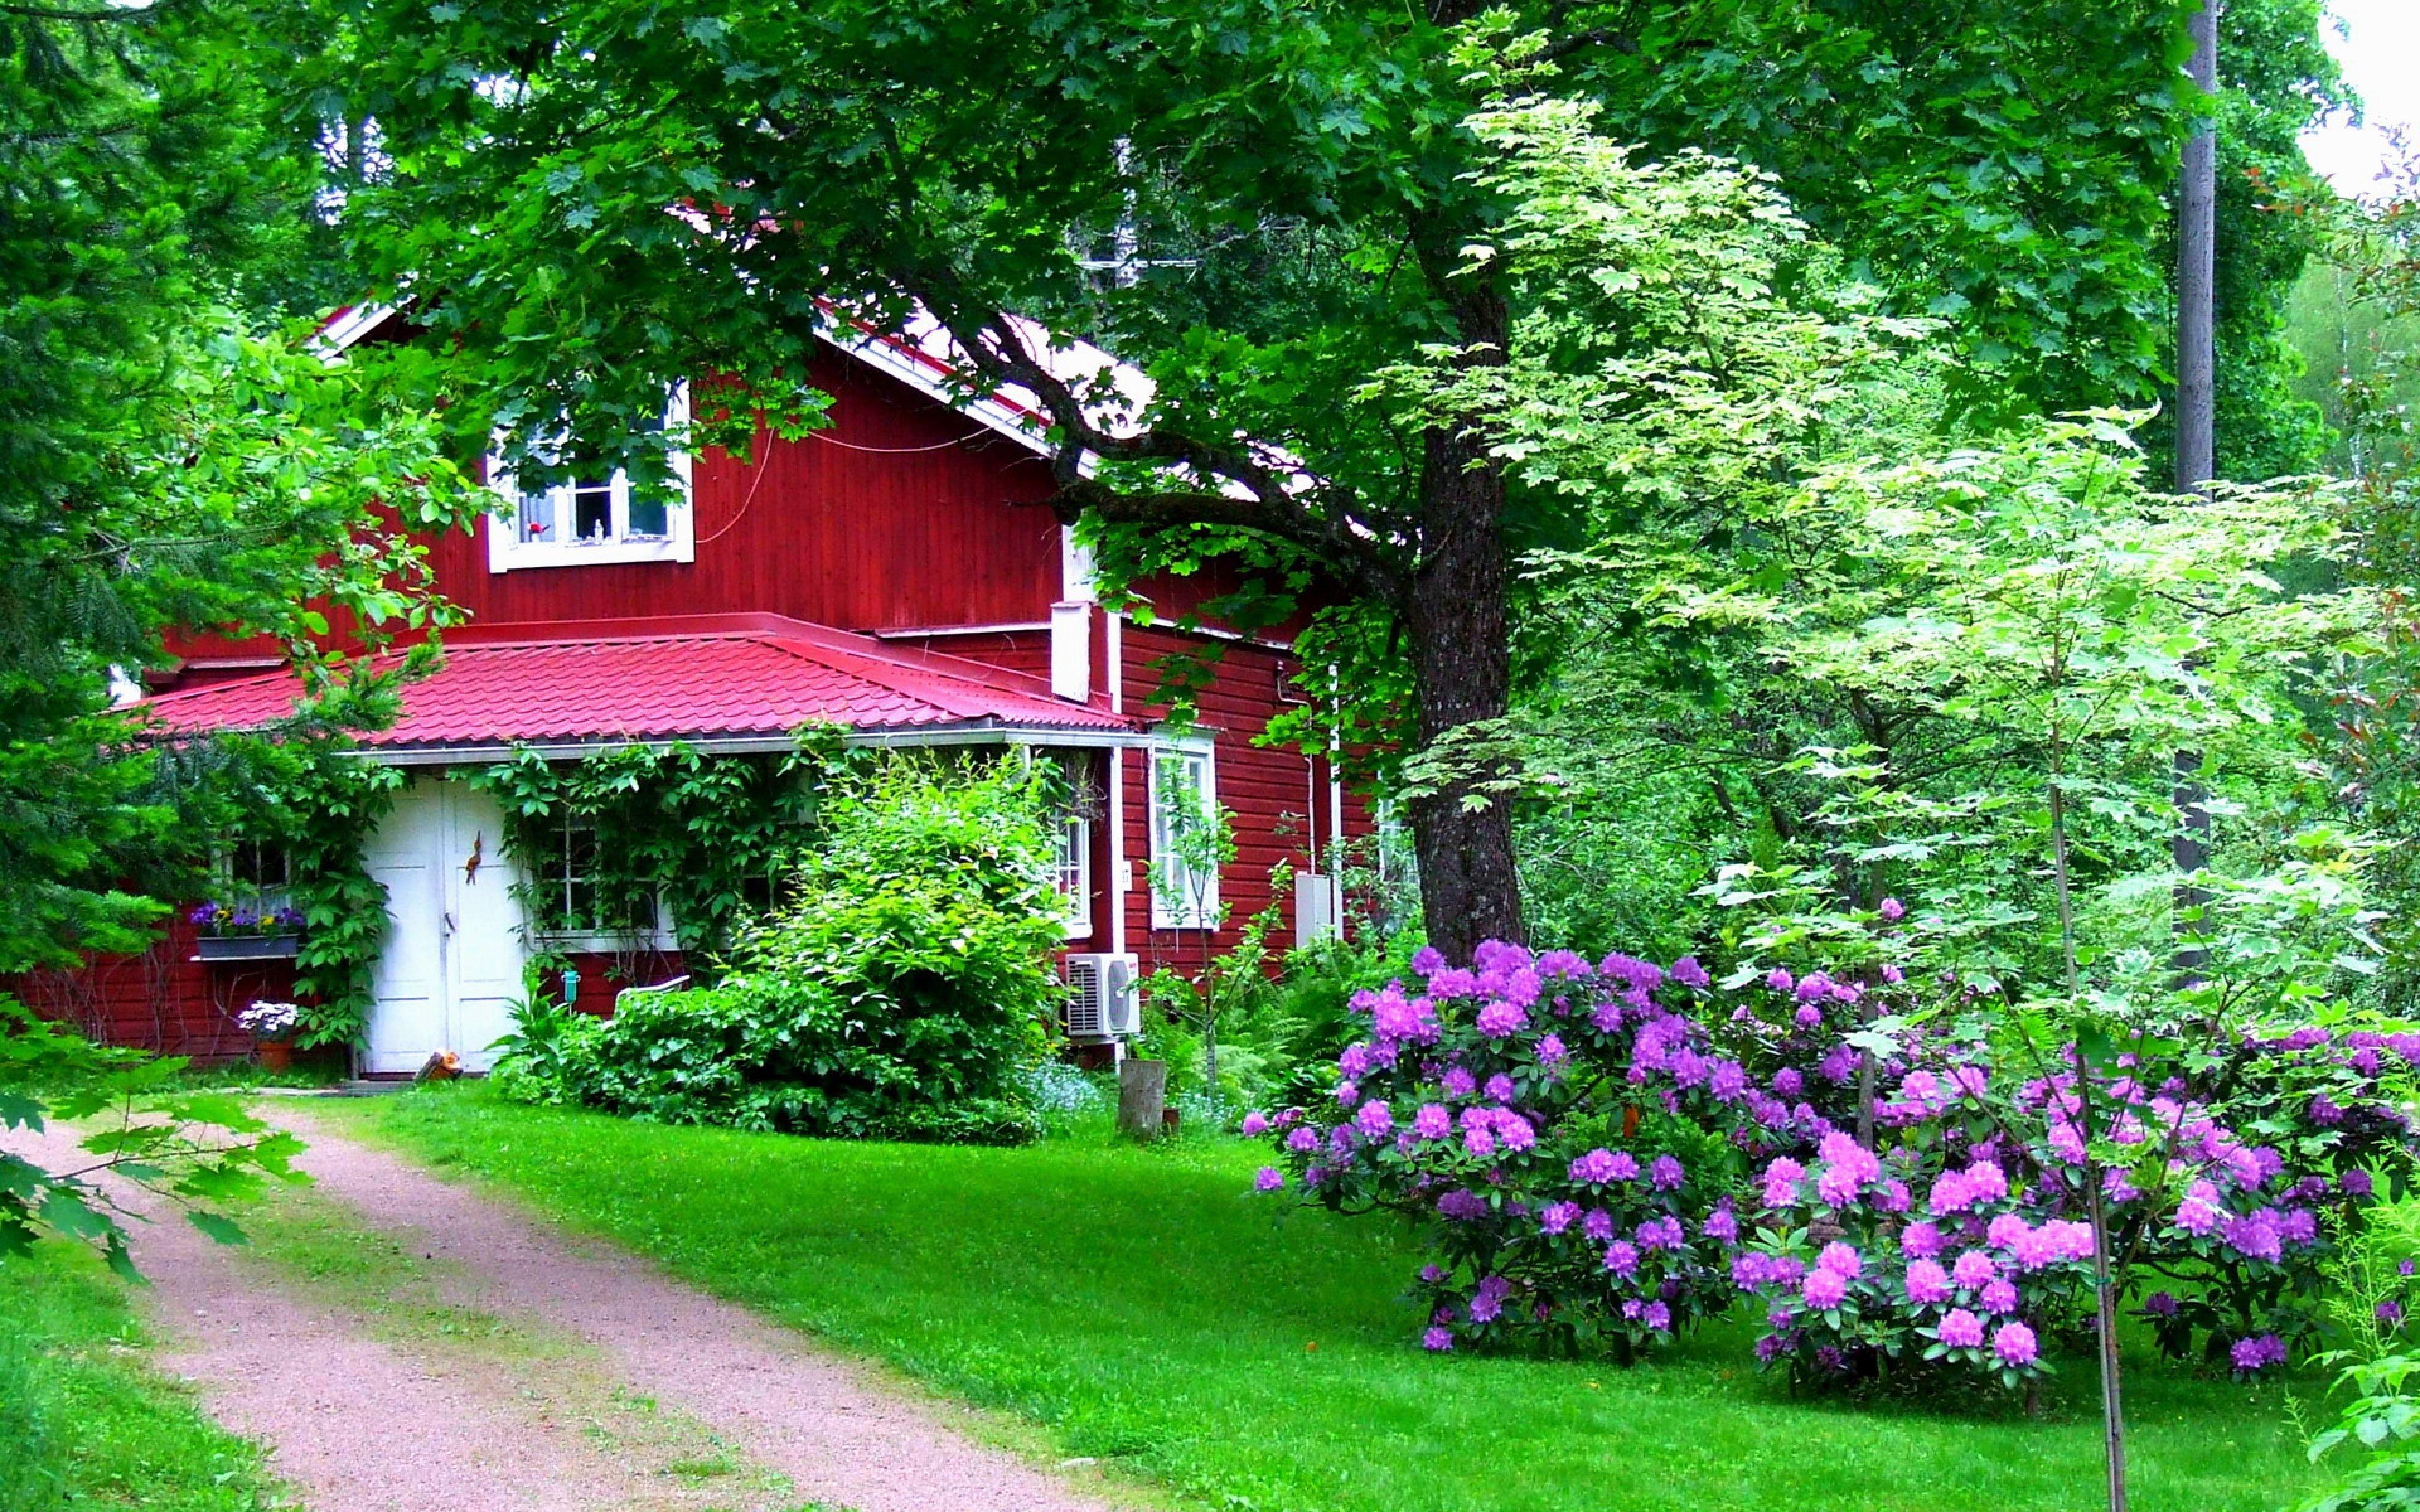 Hd Garden House Wallpapers Downloads Home Designs Wallpaper Beautiful Home Gardens Nature Garden Green Door